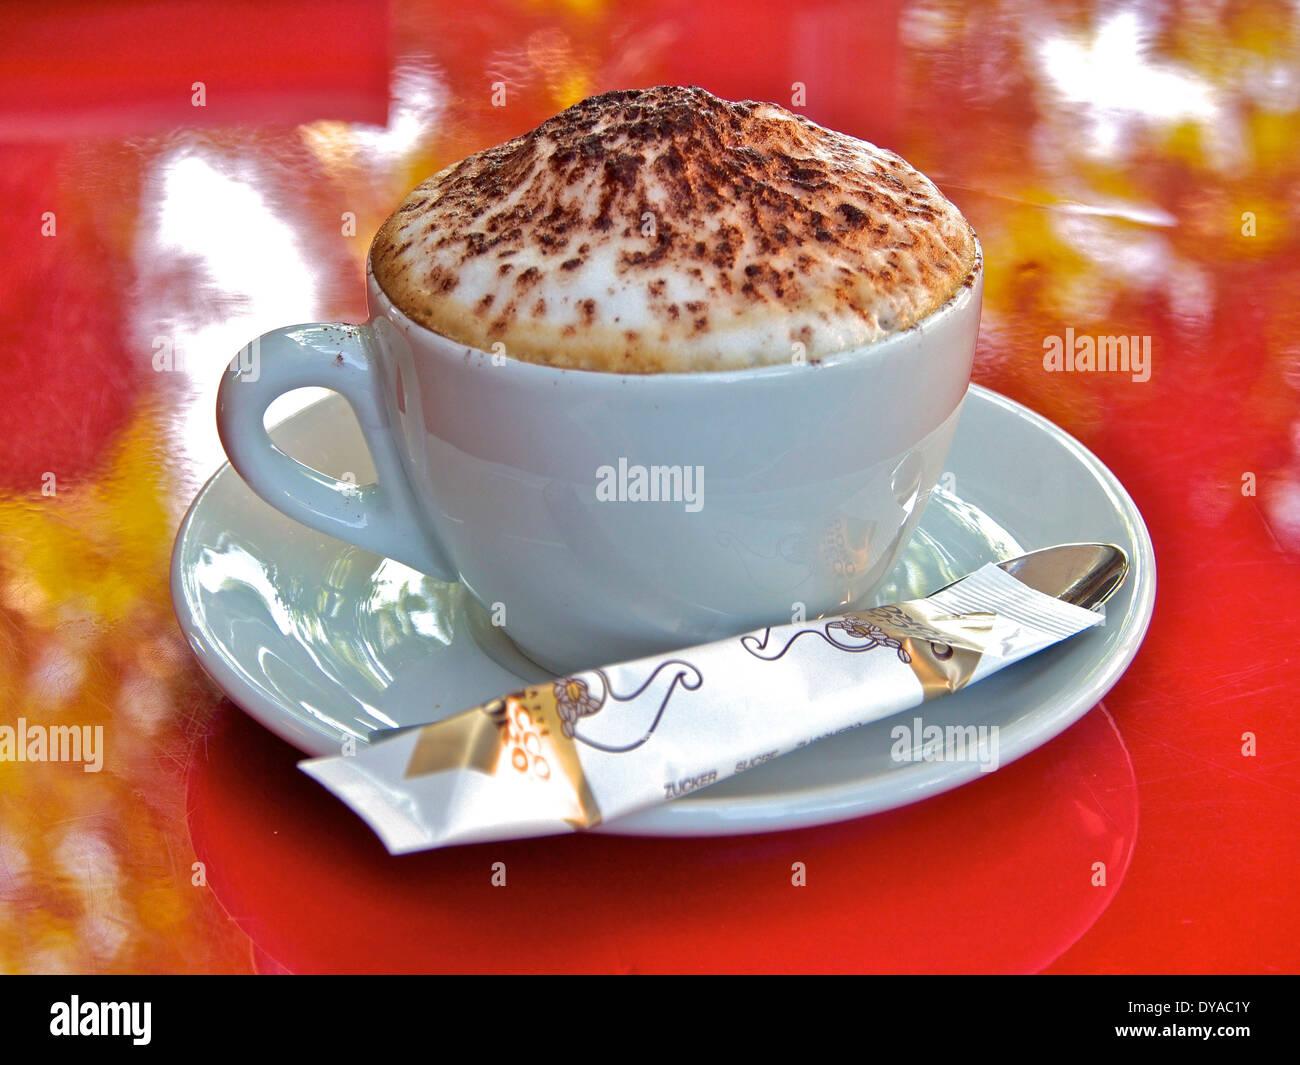 Cappuccino, Kaffee, Essen, Getränk, Croissant, Brot, Tasse, Teller, Stockbild